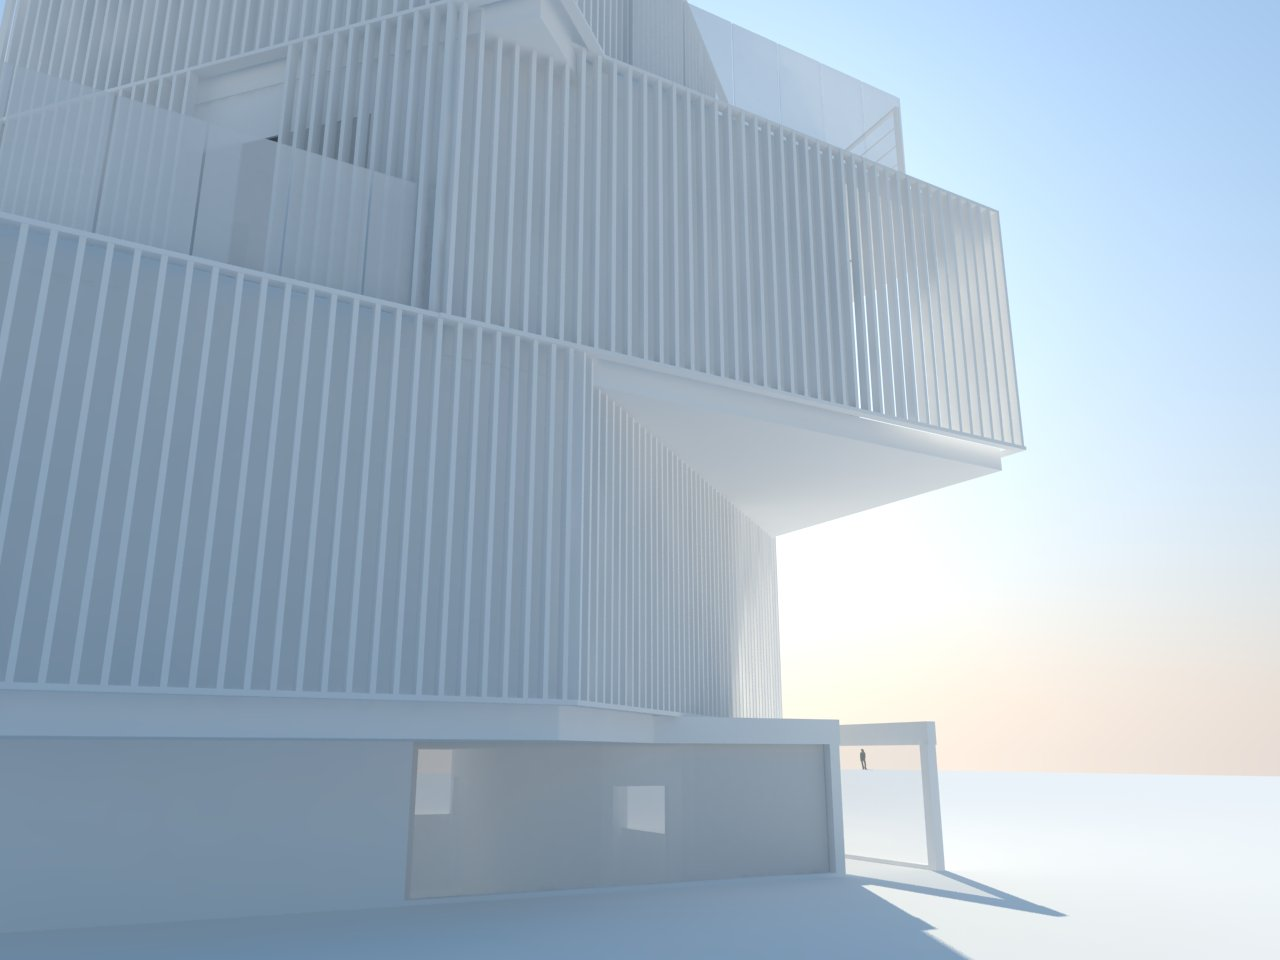 Sk studio hostel project paseo mar timo el palo cl quitapenas 115 - Ets arquitectura malaga ...